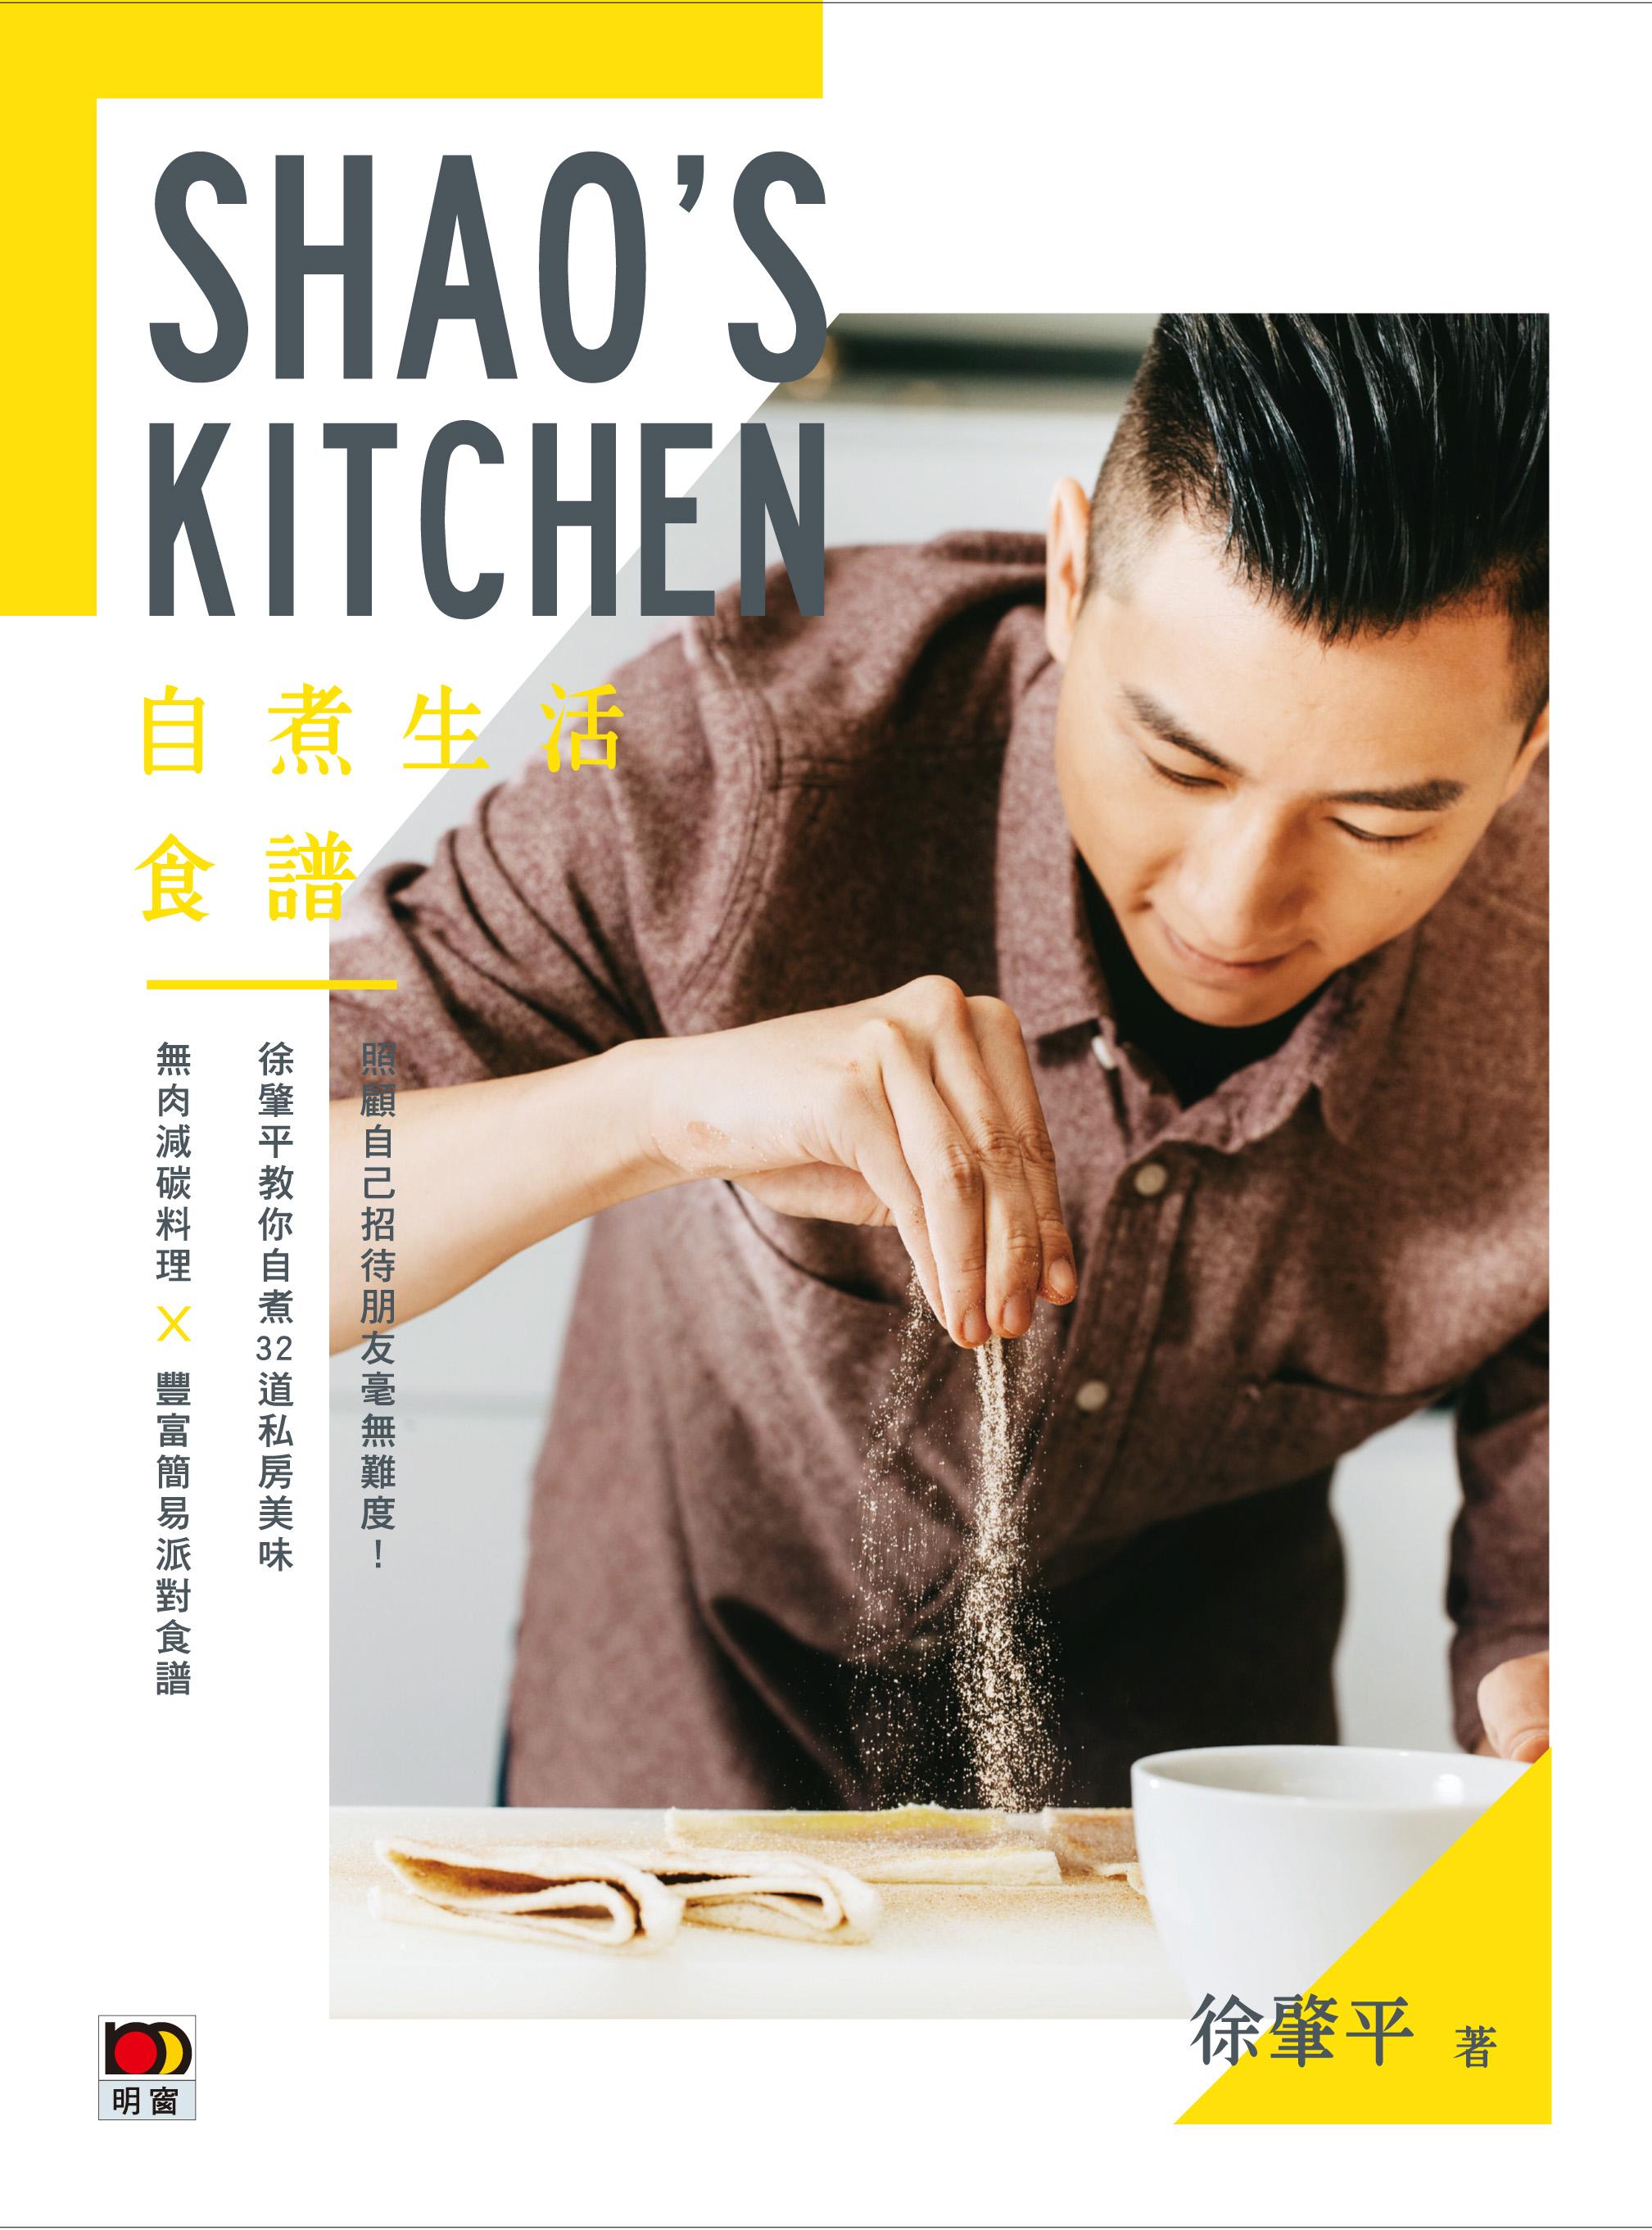 Shao's Kitchen──自煮生活食譜